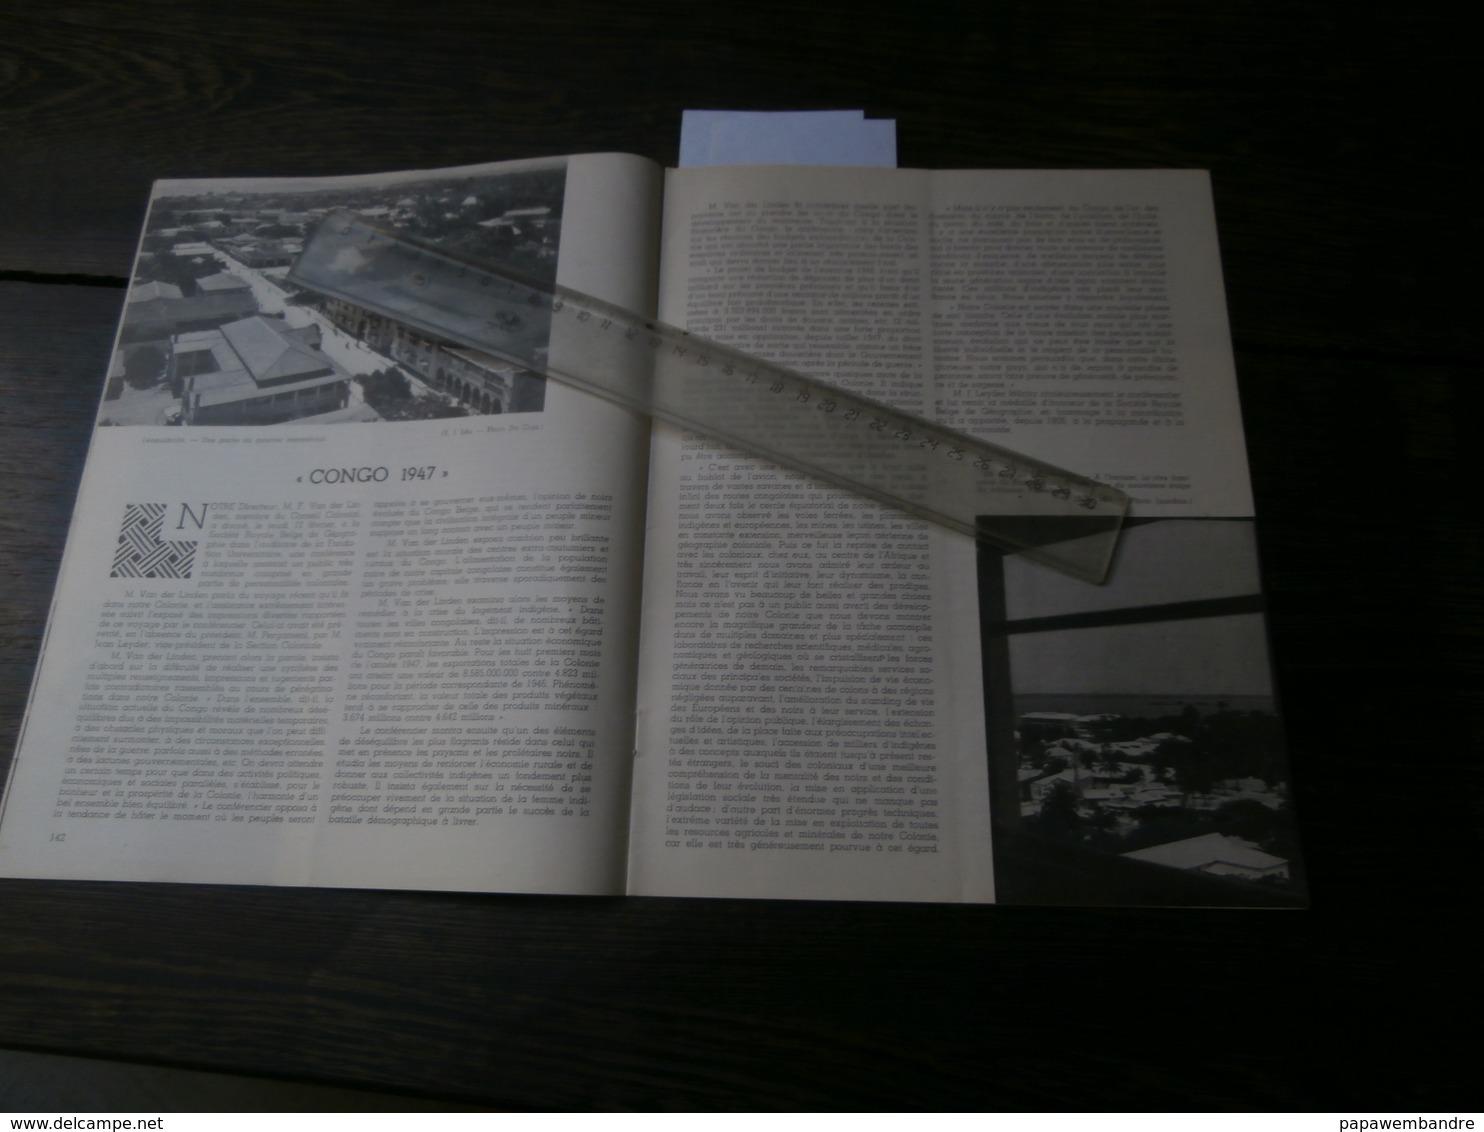 La Revue Coloniale Belge 58 (01/03/1948) : Congo, Shinkakasa, Banzyville, - Livres, BD, Revues